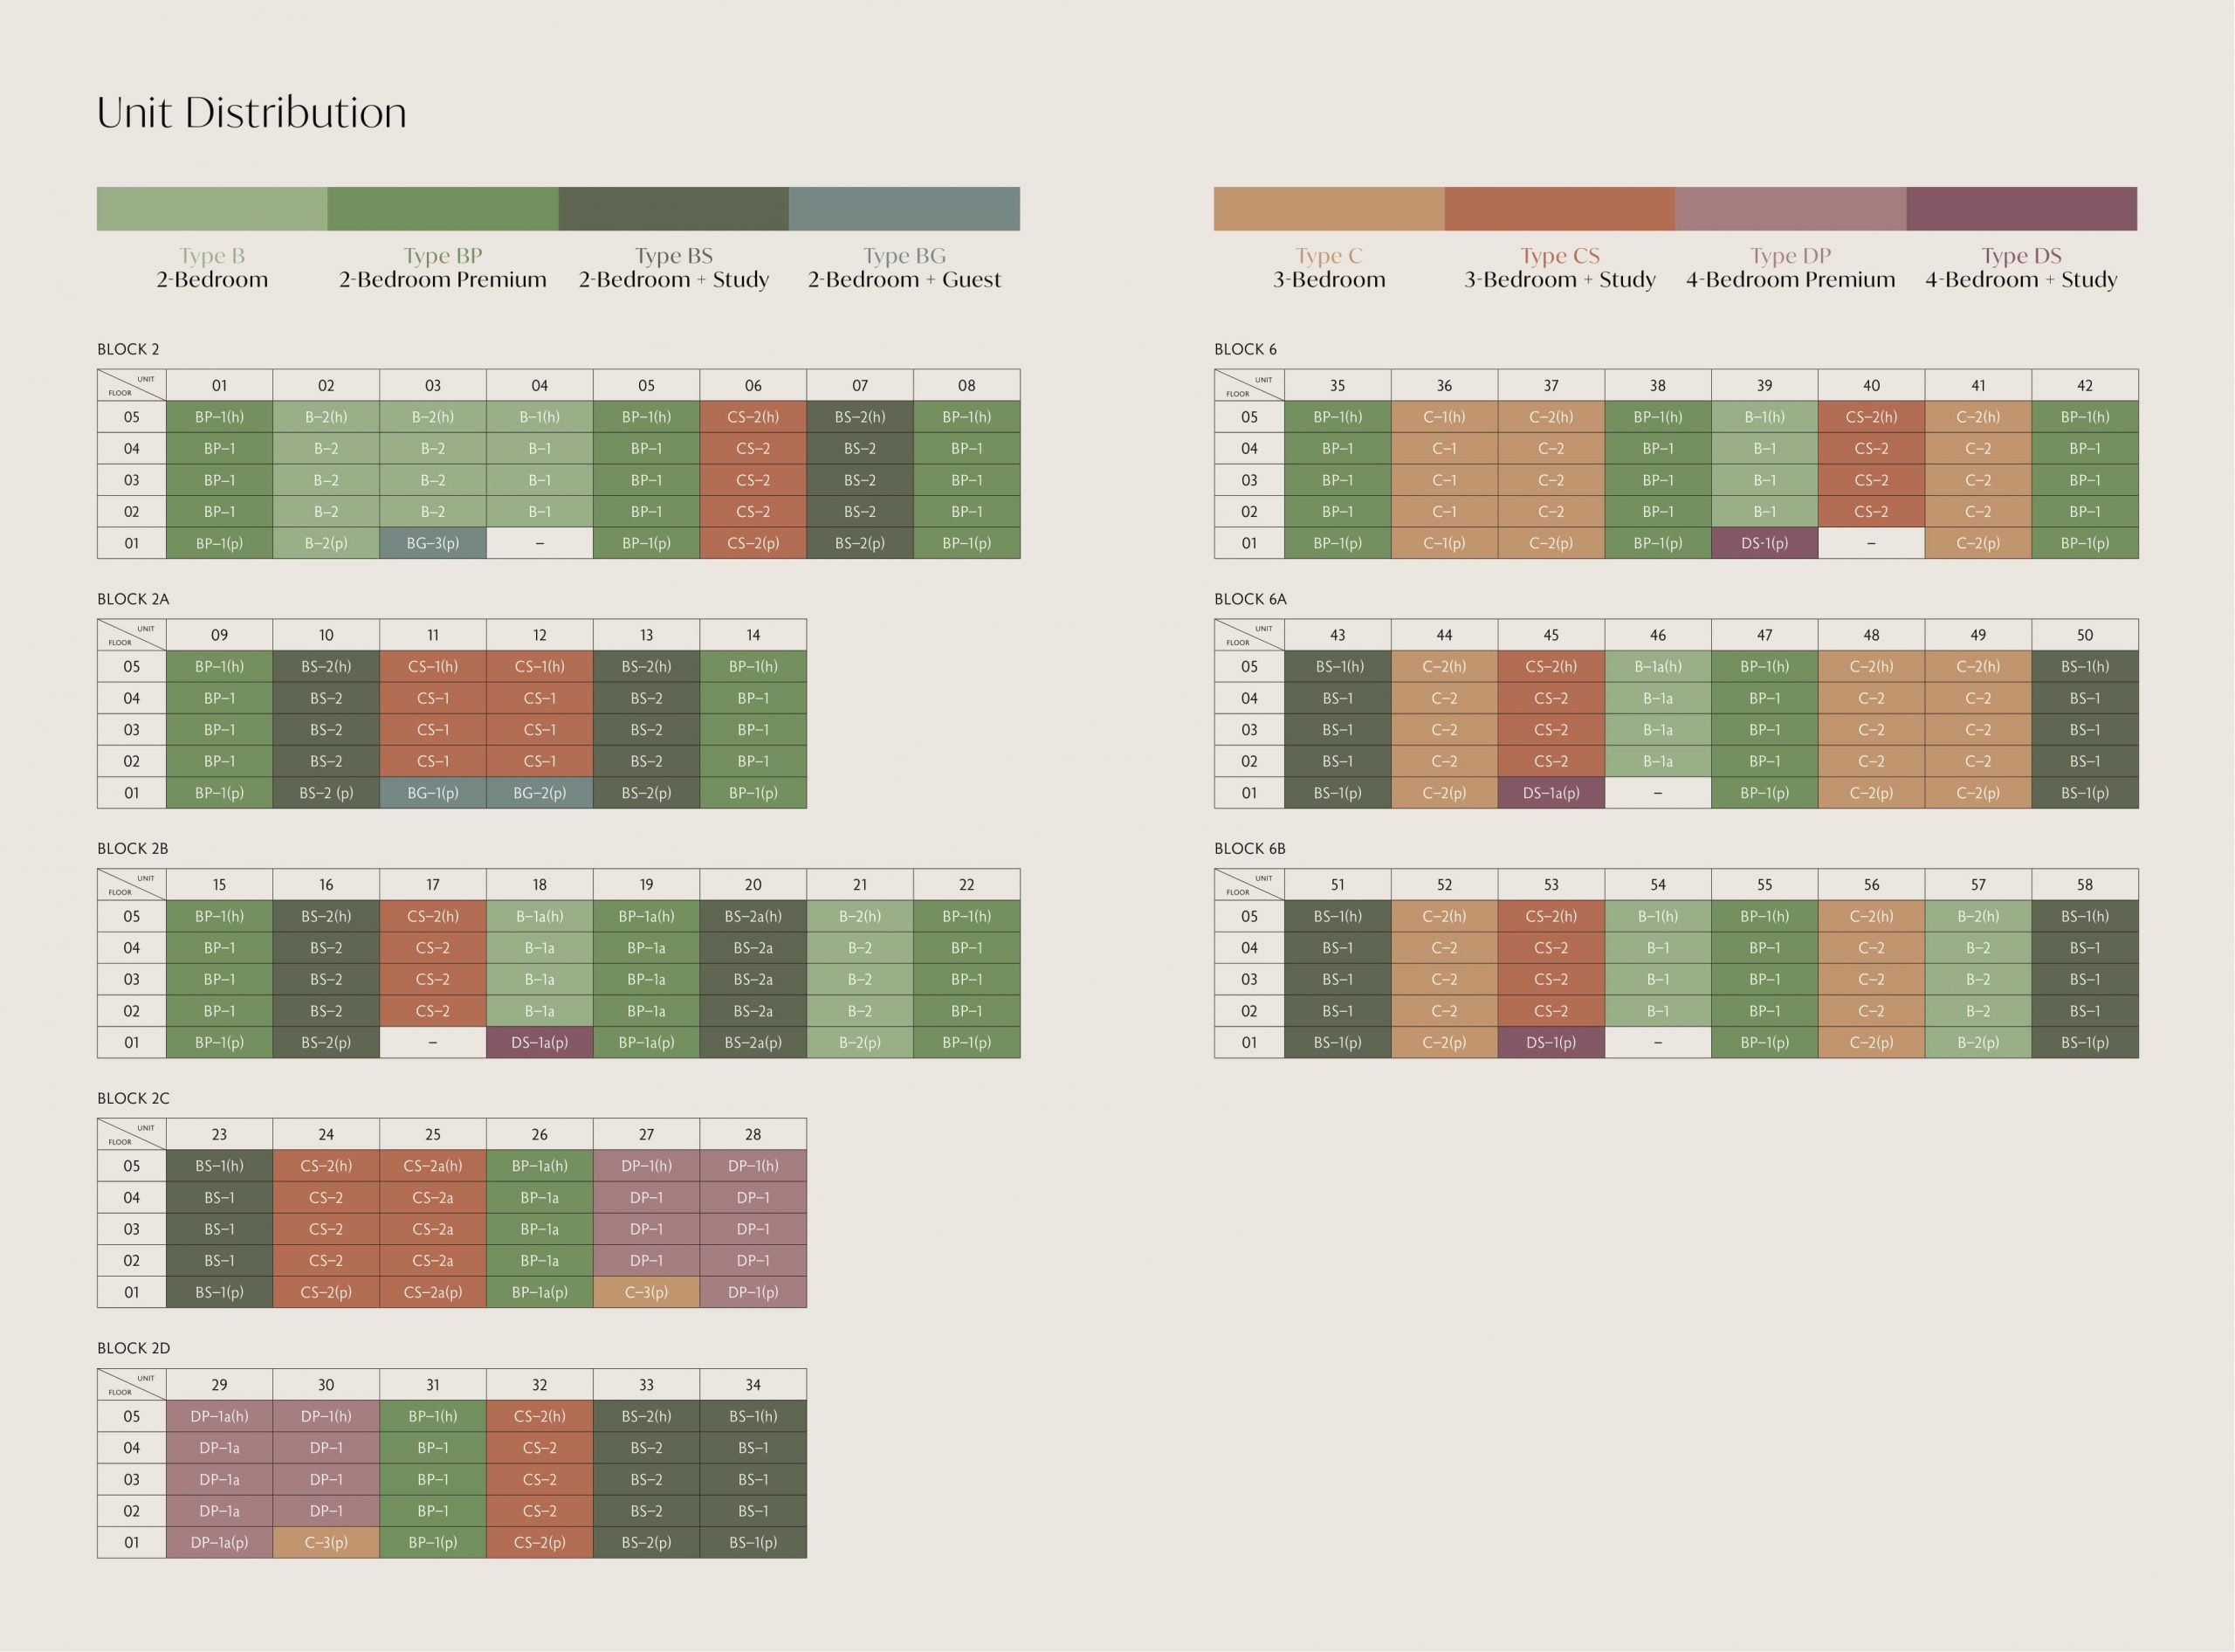 Royalgreen's site plan and unit distribution